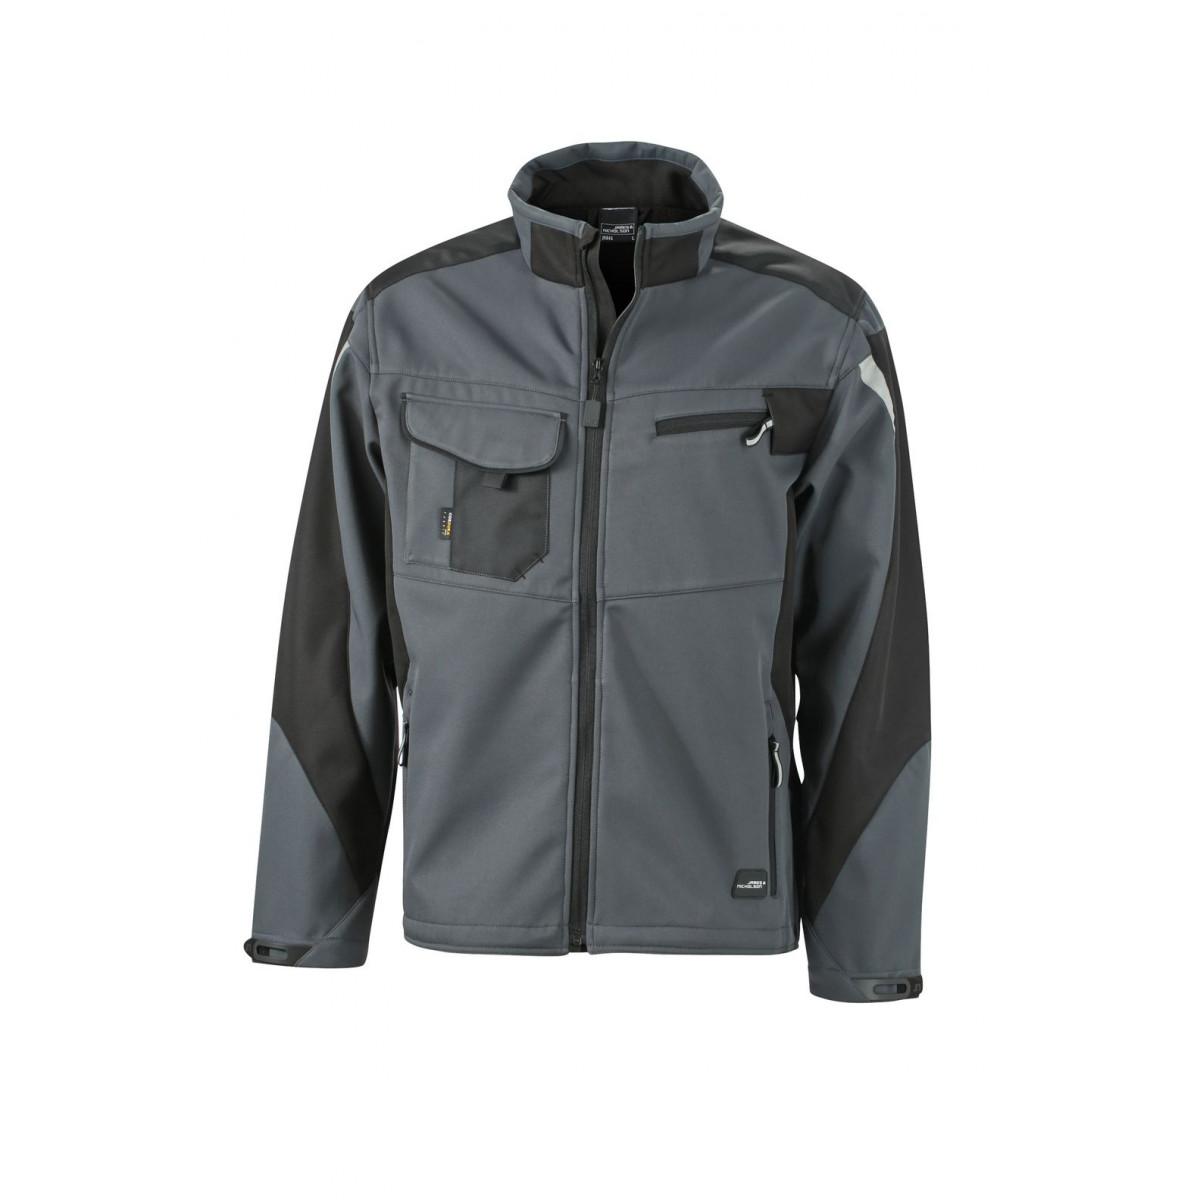 Куртка мужская JN844 Workwear Softshell Jacket - Карбон/Черный